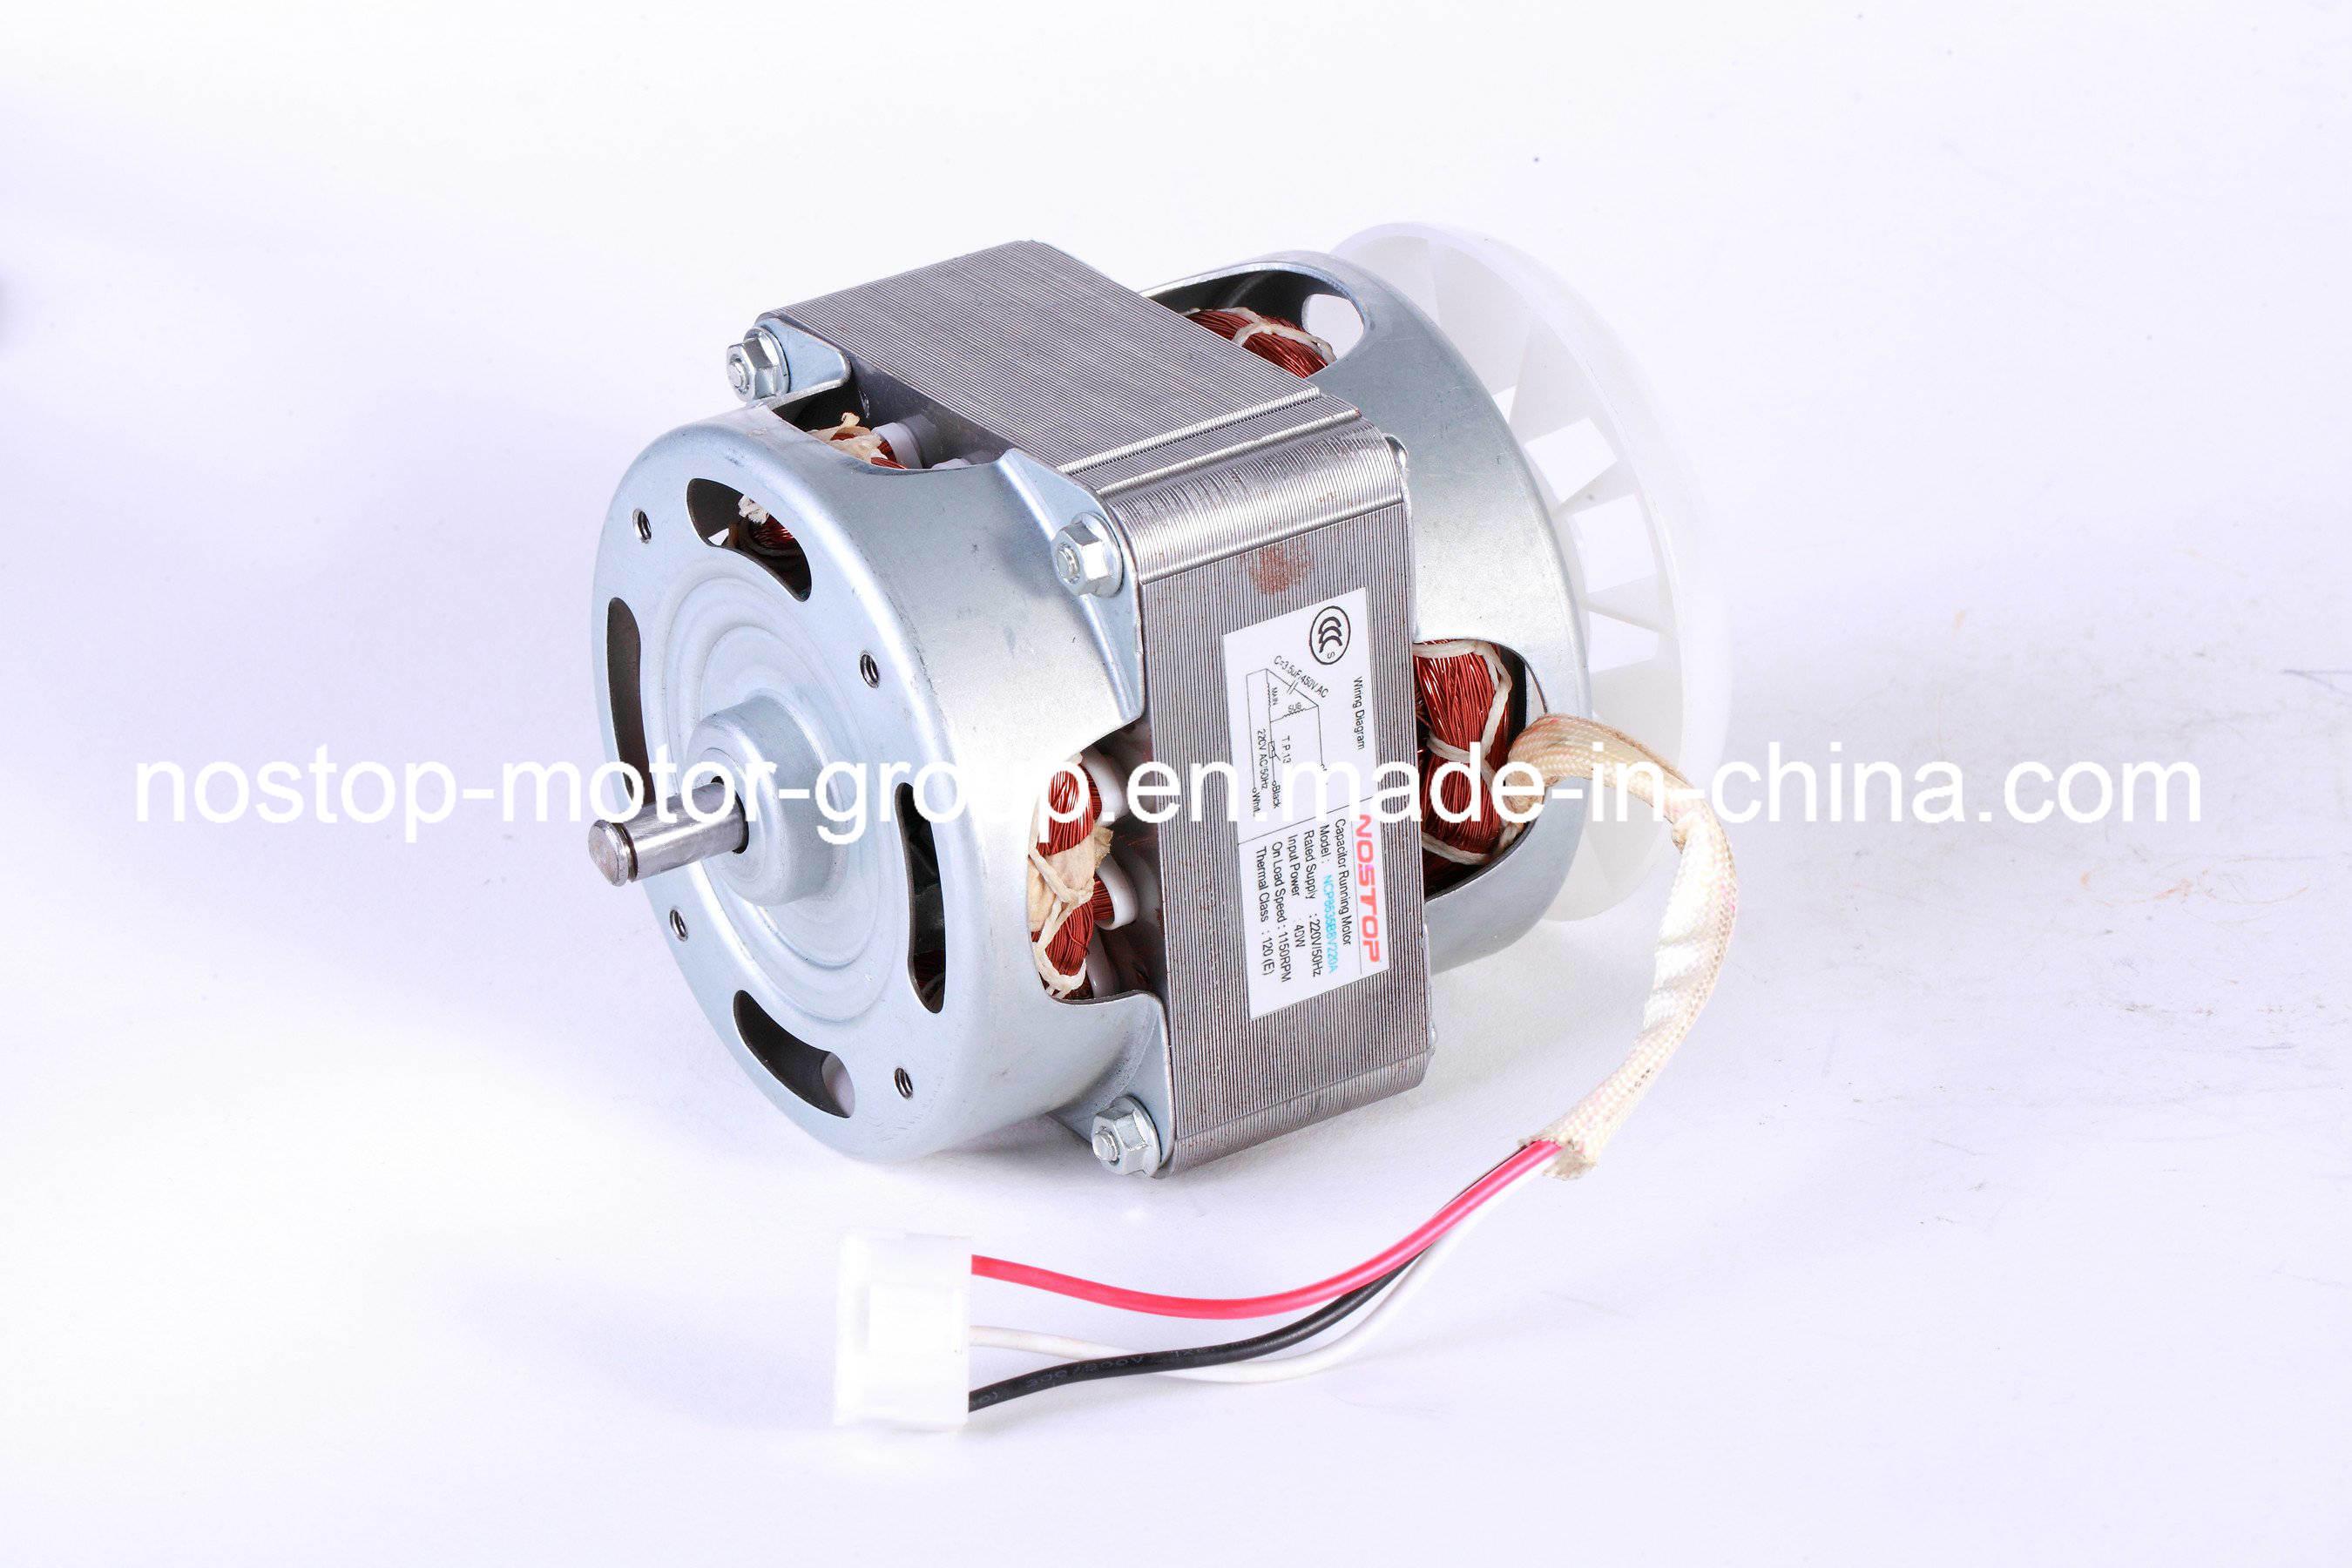 China 220V/50Hz Automatic AC Bread Maker/Toaster Motor - China Kitchen Bread  Maker, Bread Toaster